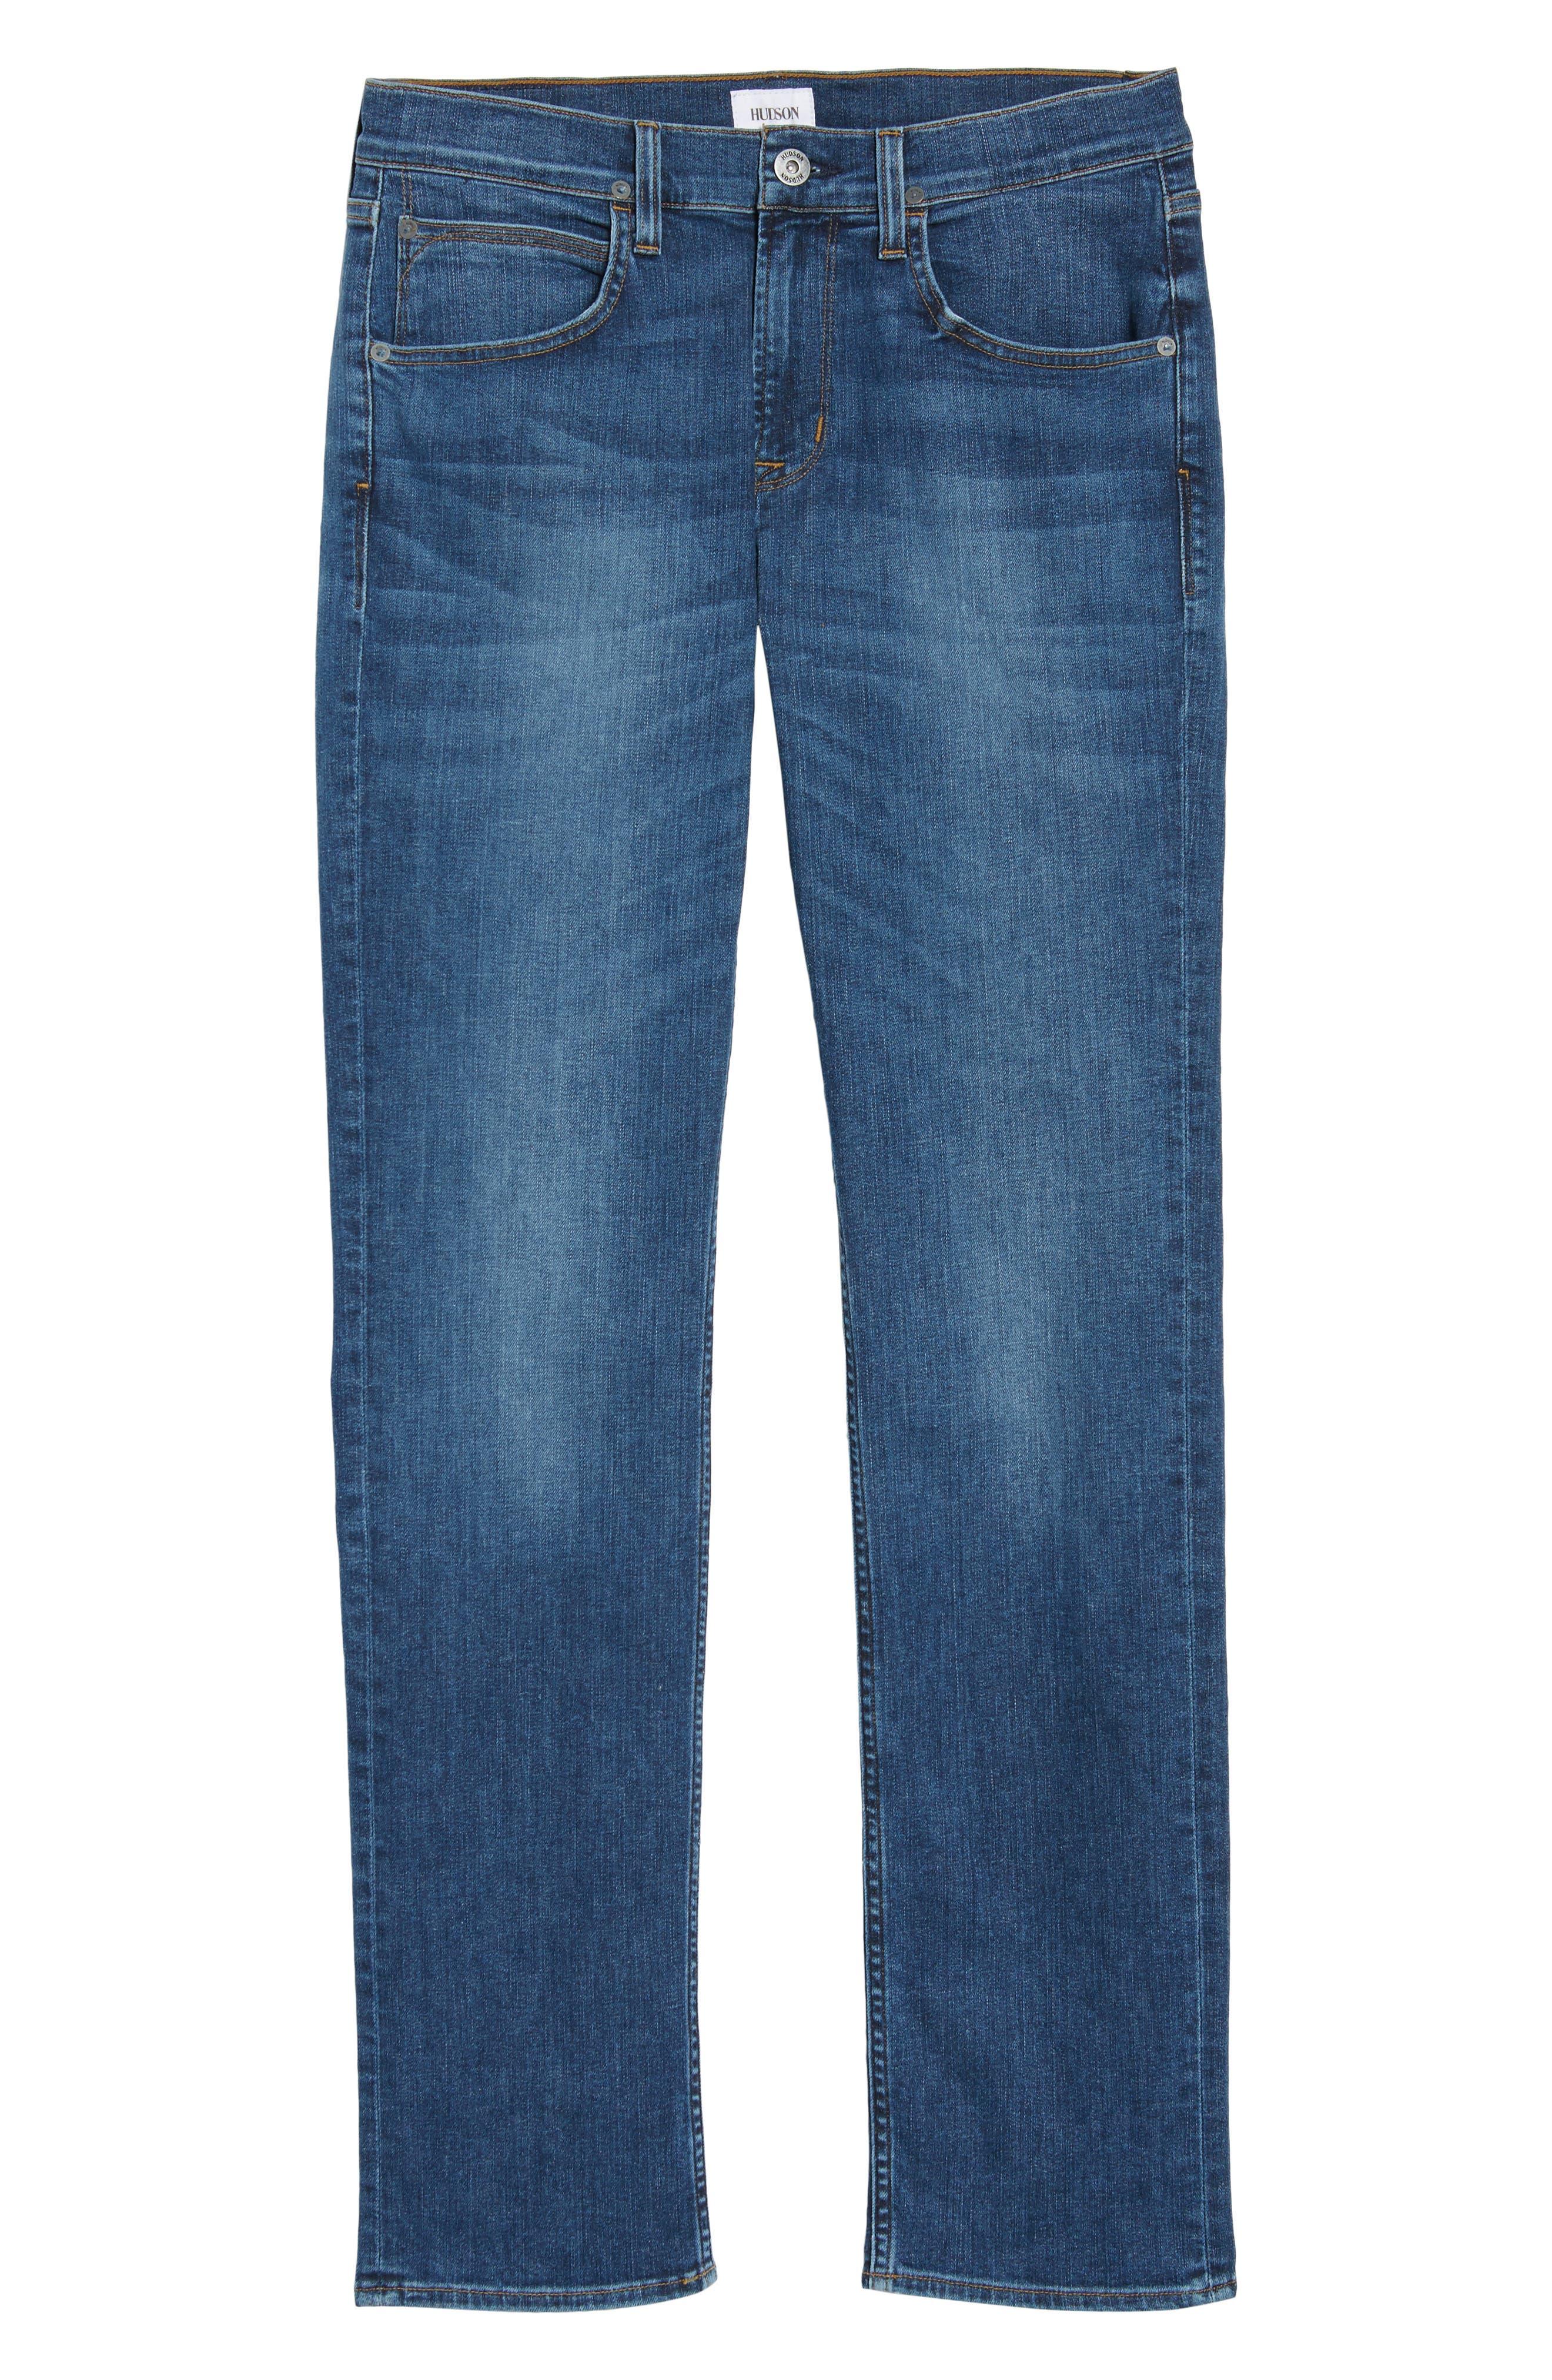 Byron Slim Straight Leg Jeans,                             Alternate thumbnail 6, color,                             421